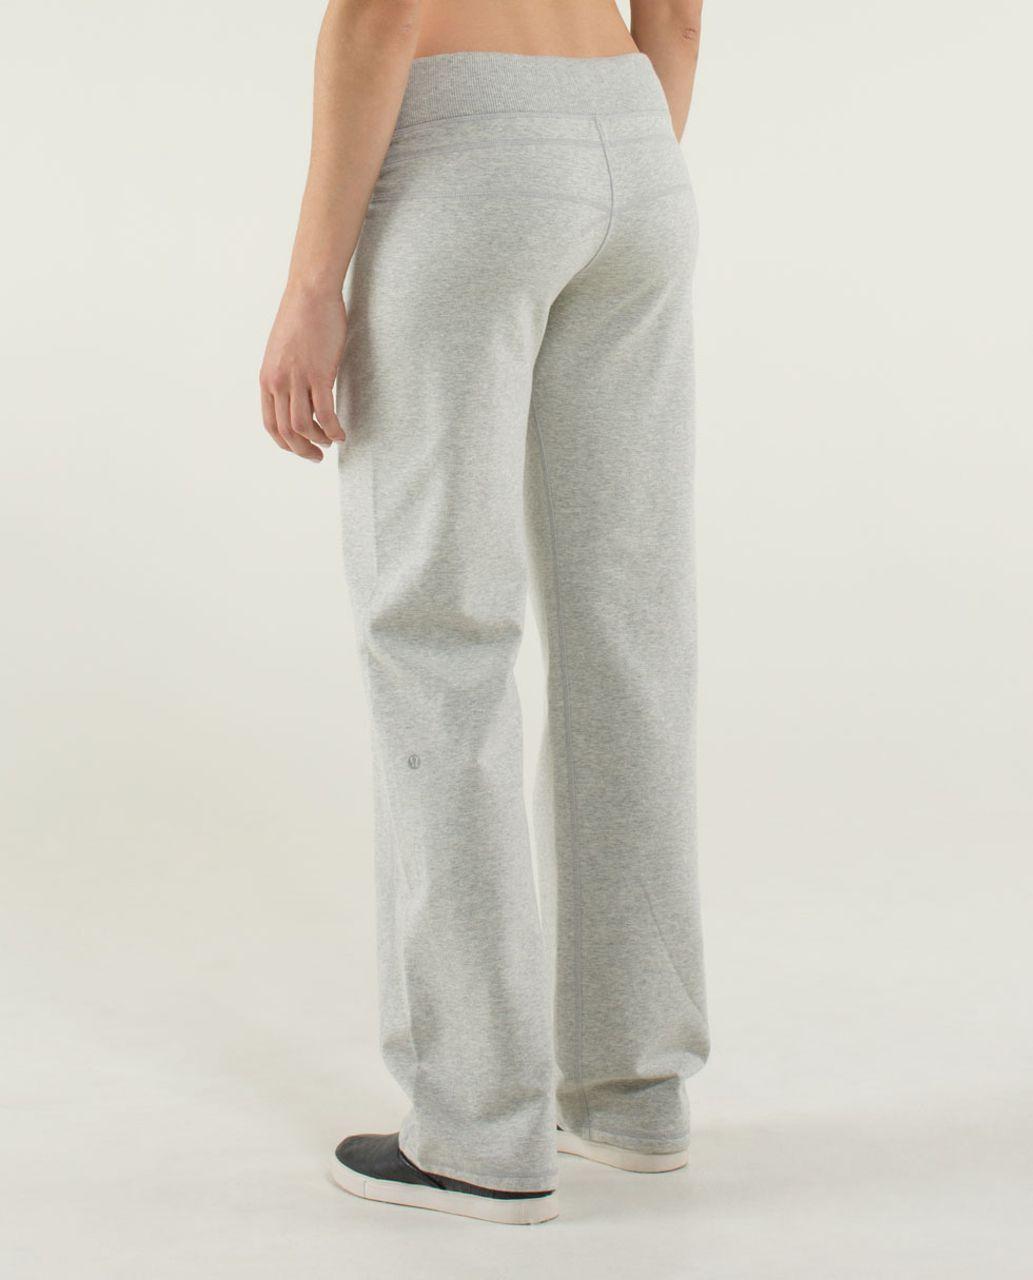 1ca0b97427 Lululemon Calm & Cozy Pant - Heathered Light Grey - lulu fanatics